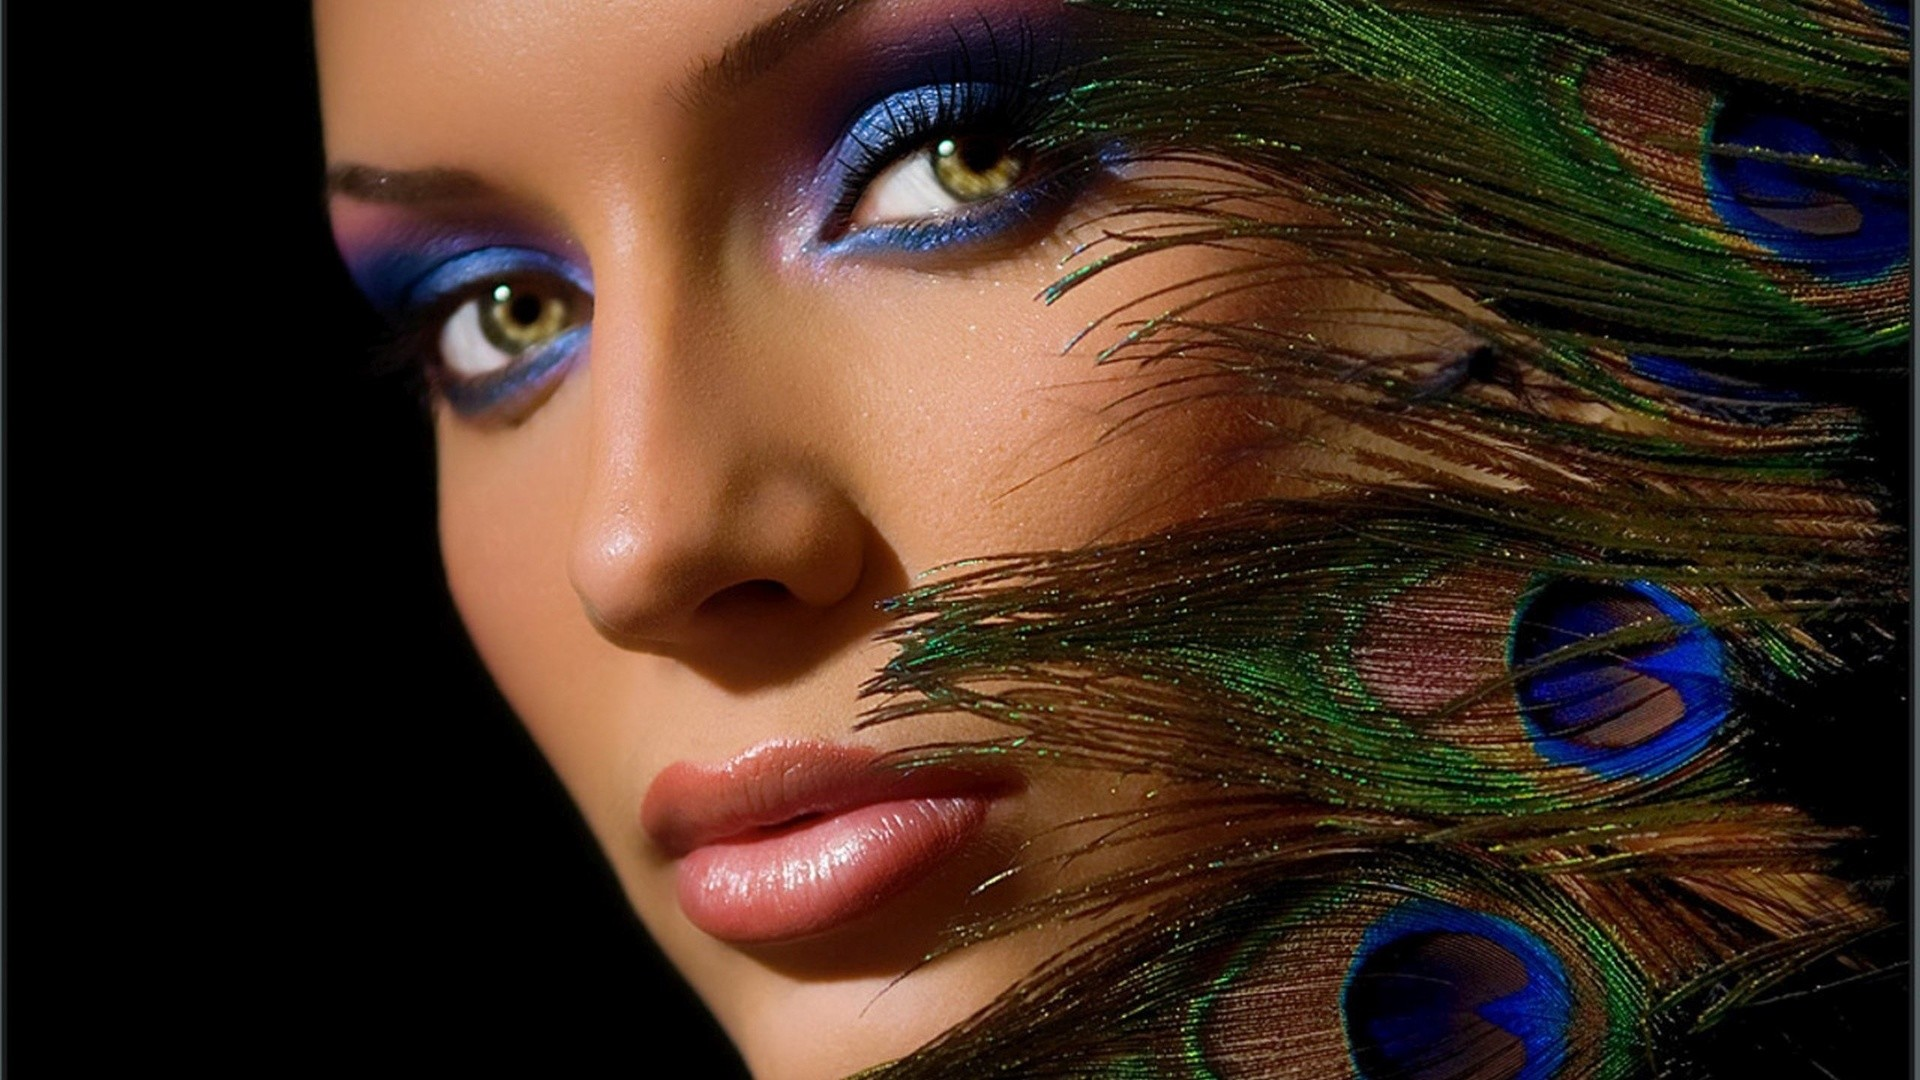 <b>Beautiful Women Faces Wallpaper</b> – WallpaperSafari